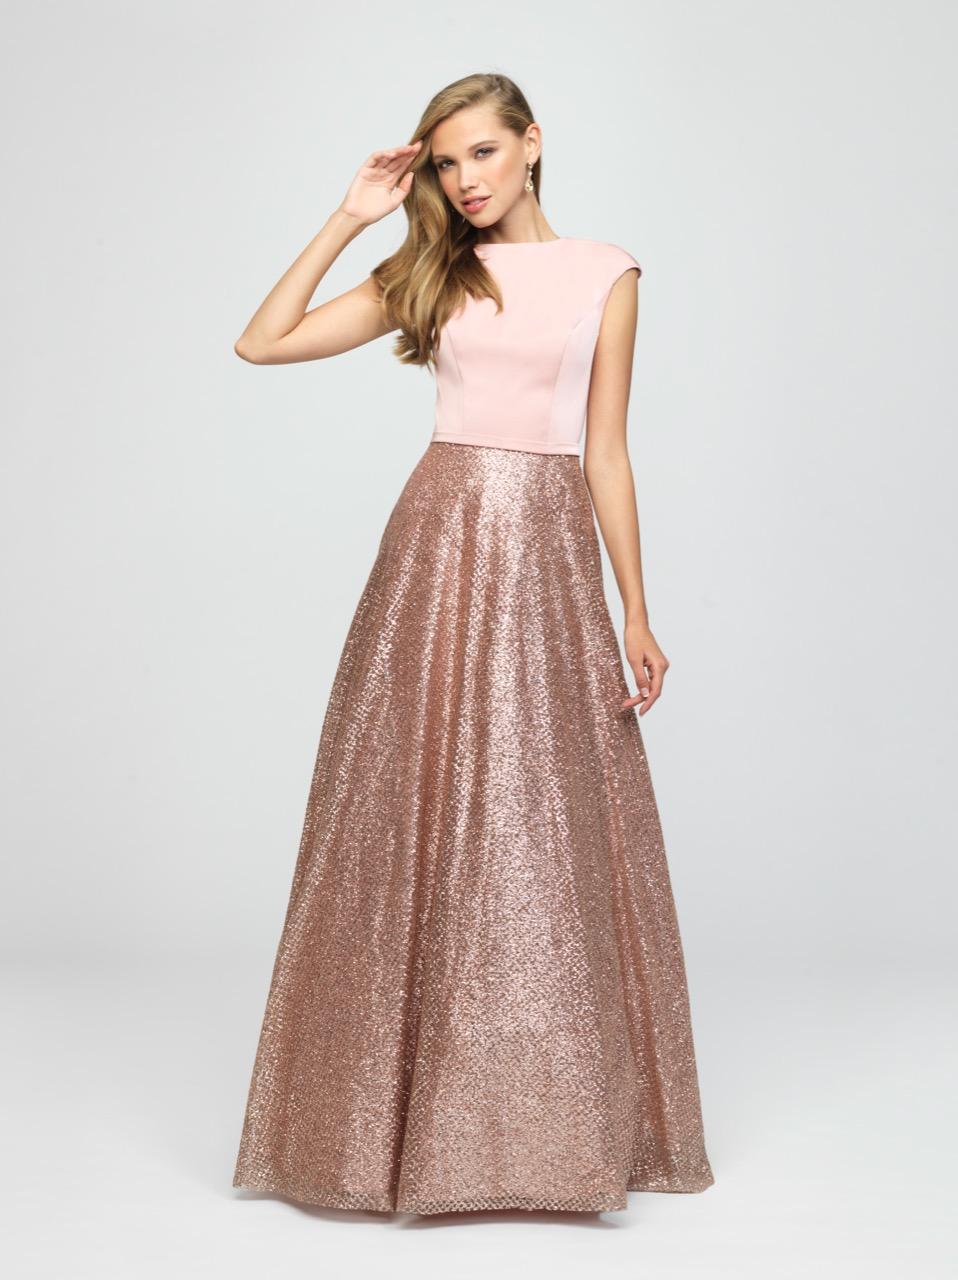 Allure 19-250M RoseGold Modest Prom